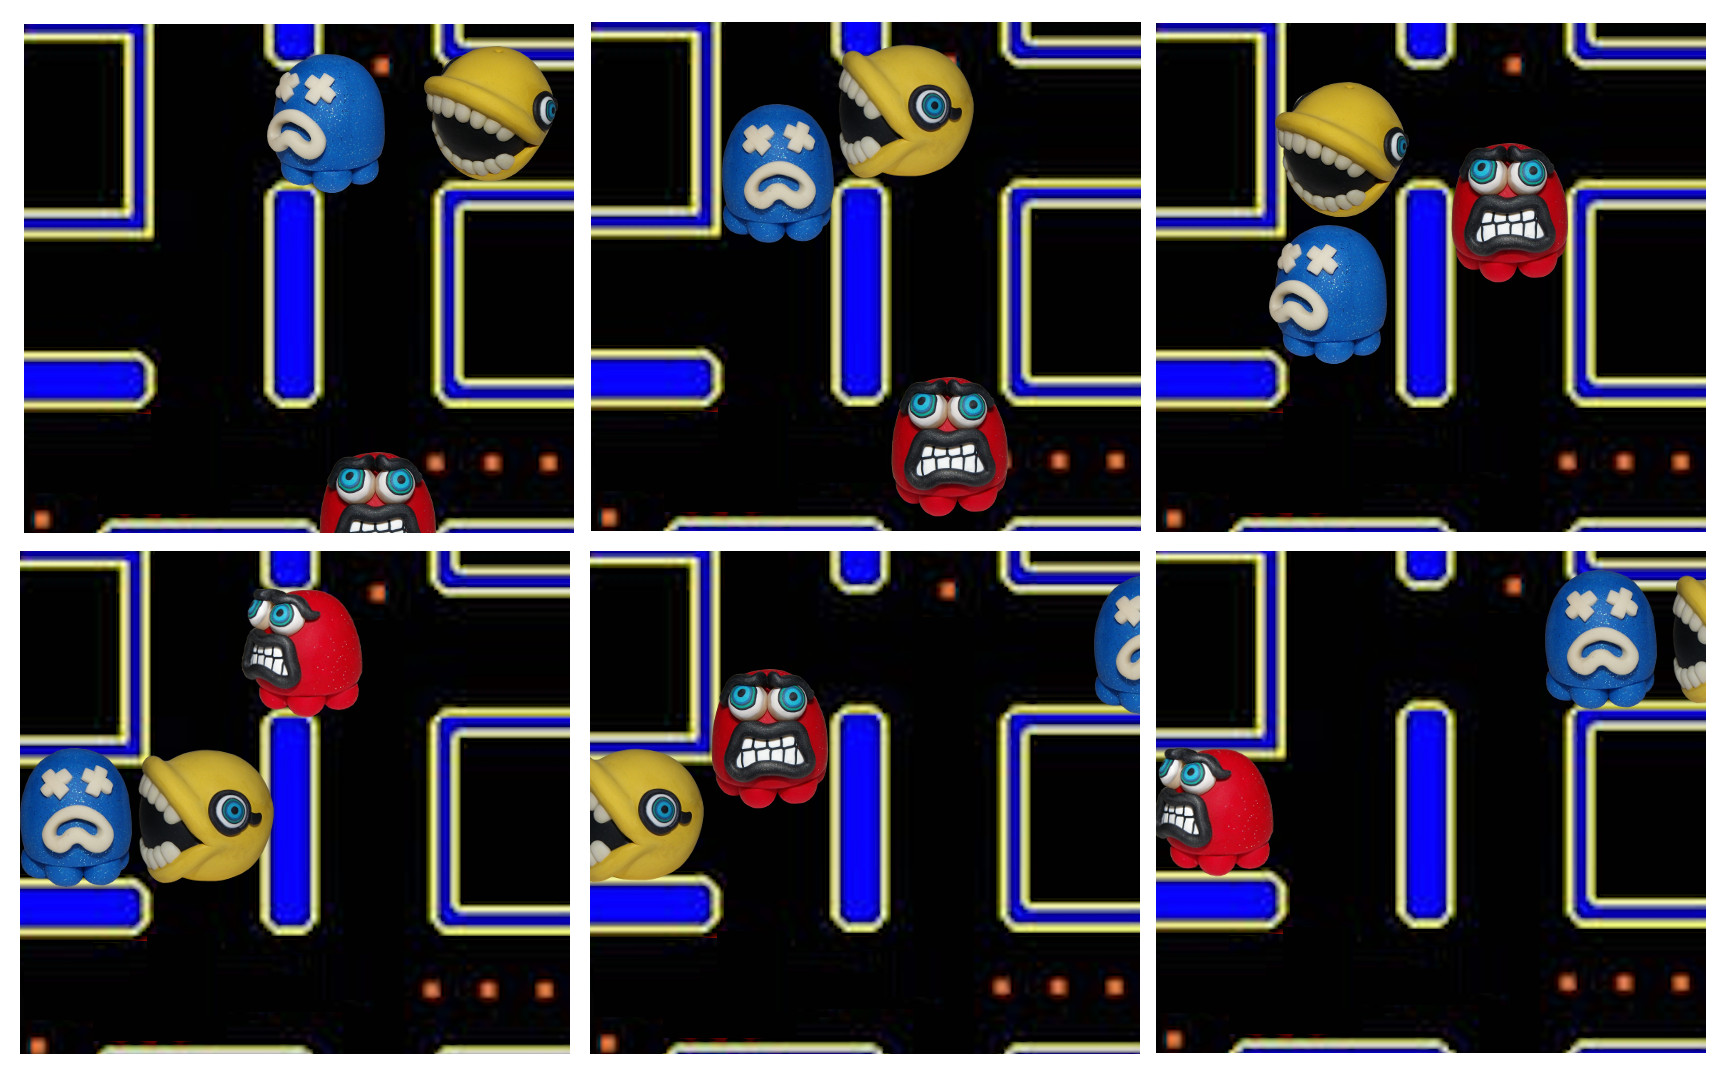 Pac Man maniac!